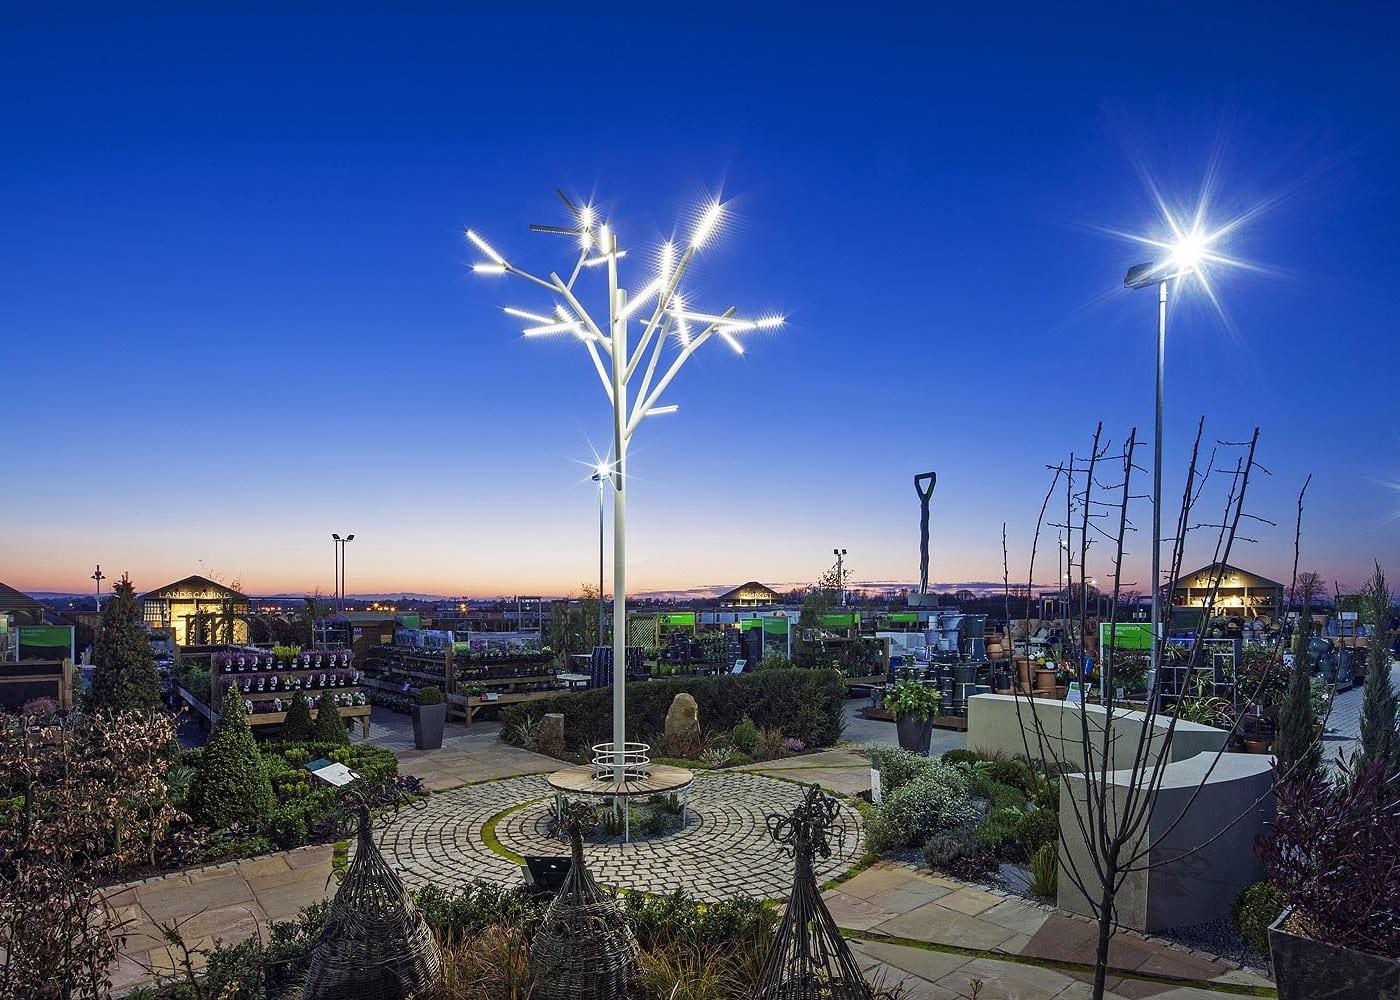 retail lighting design: The Garden Centre outside shop area